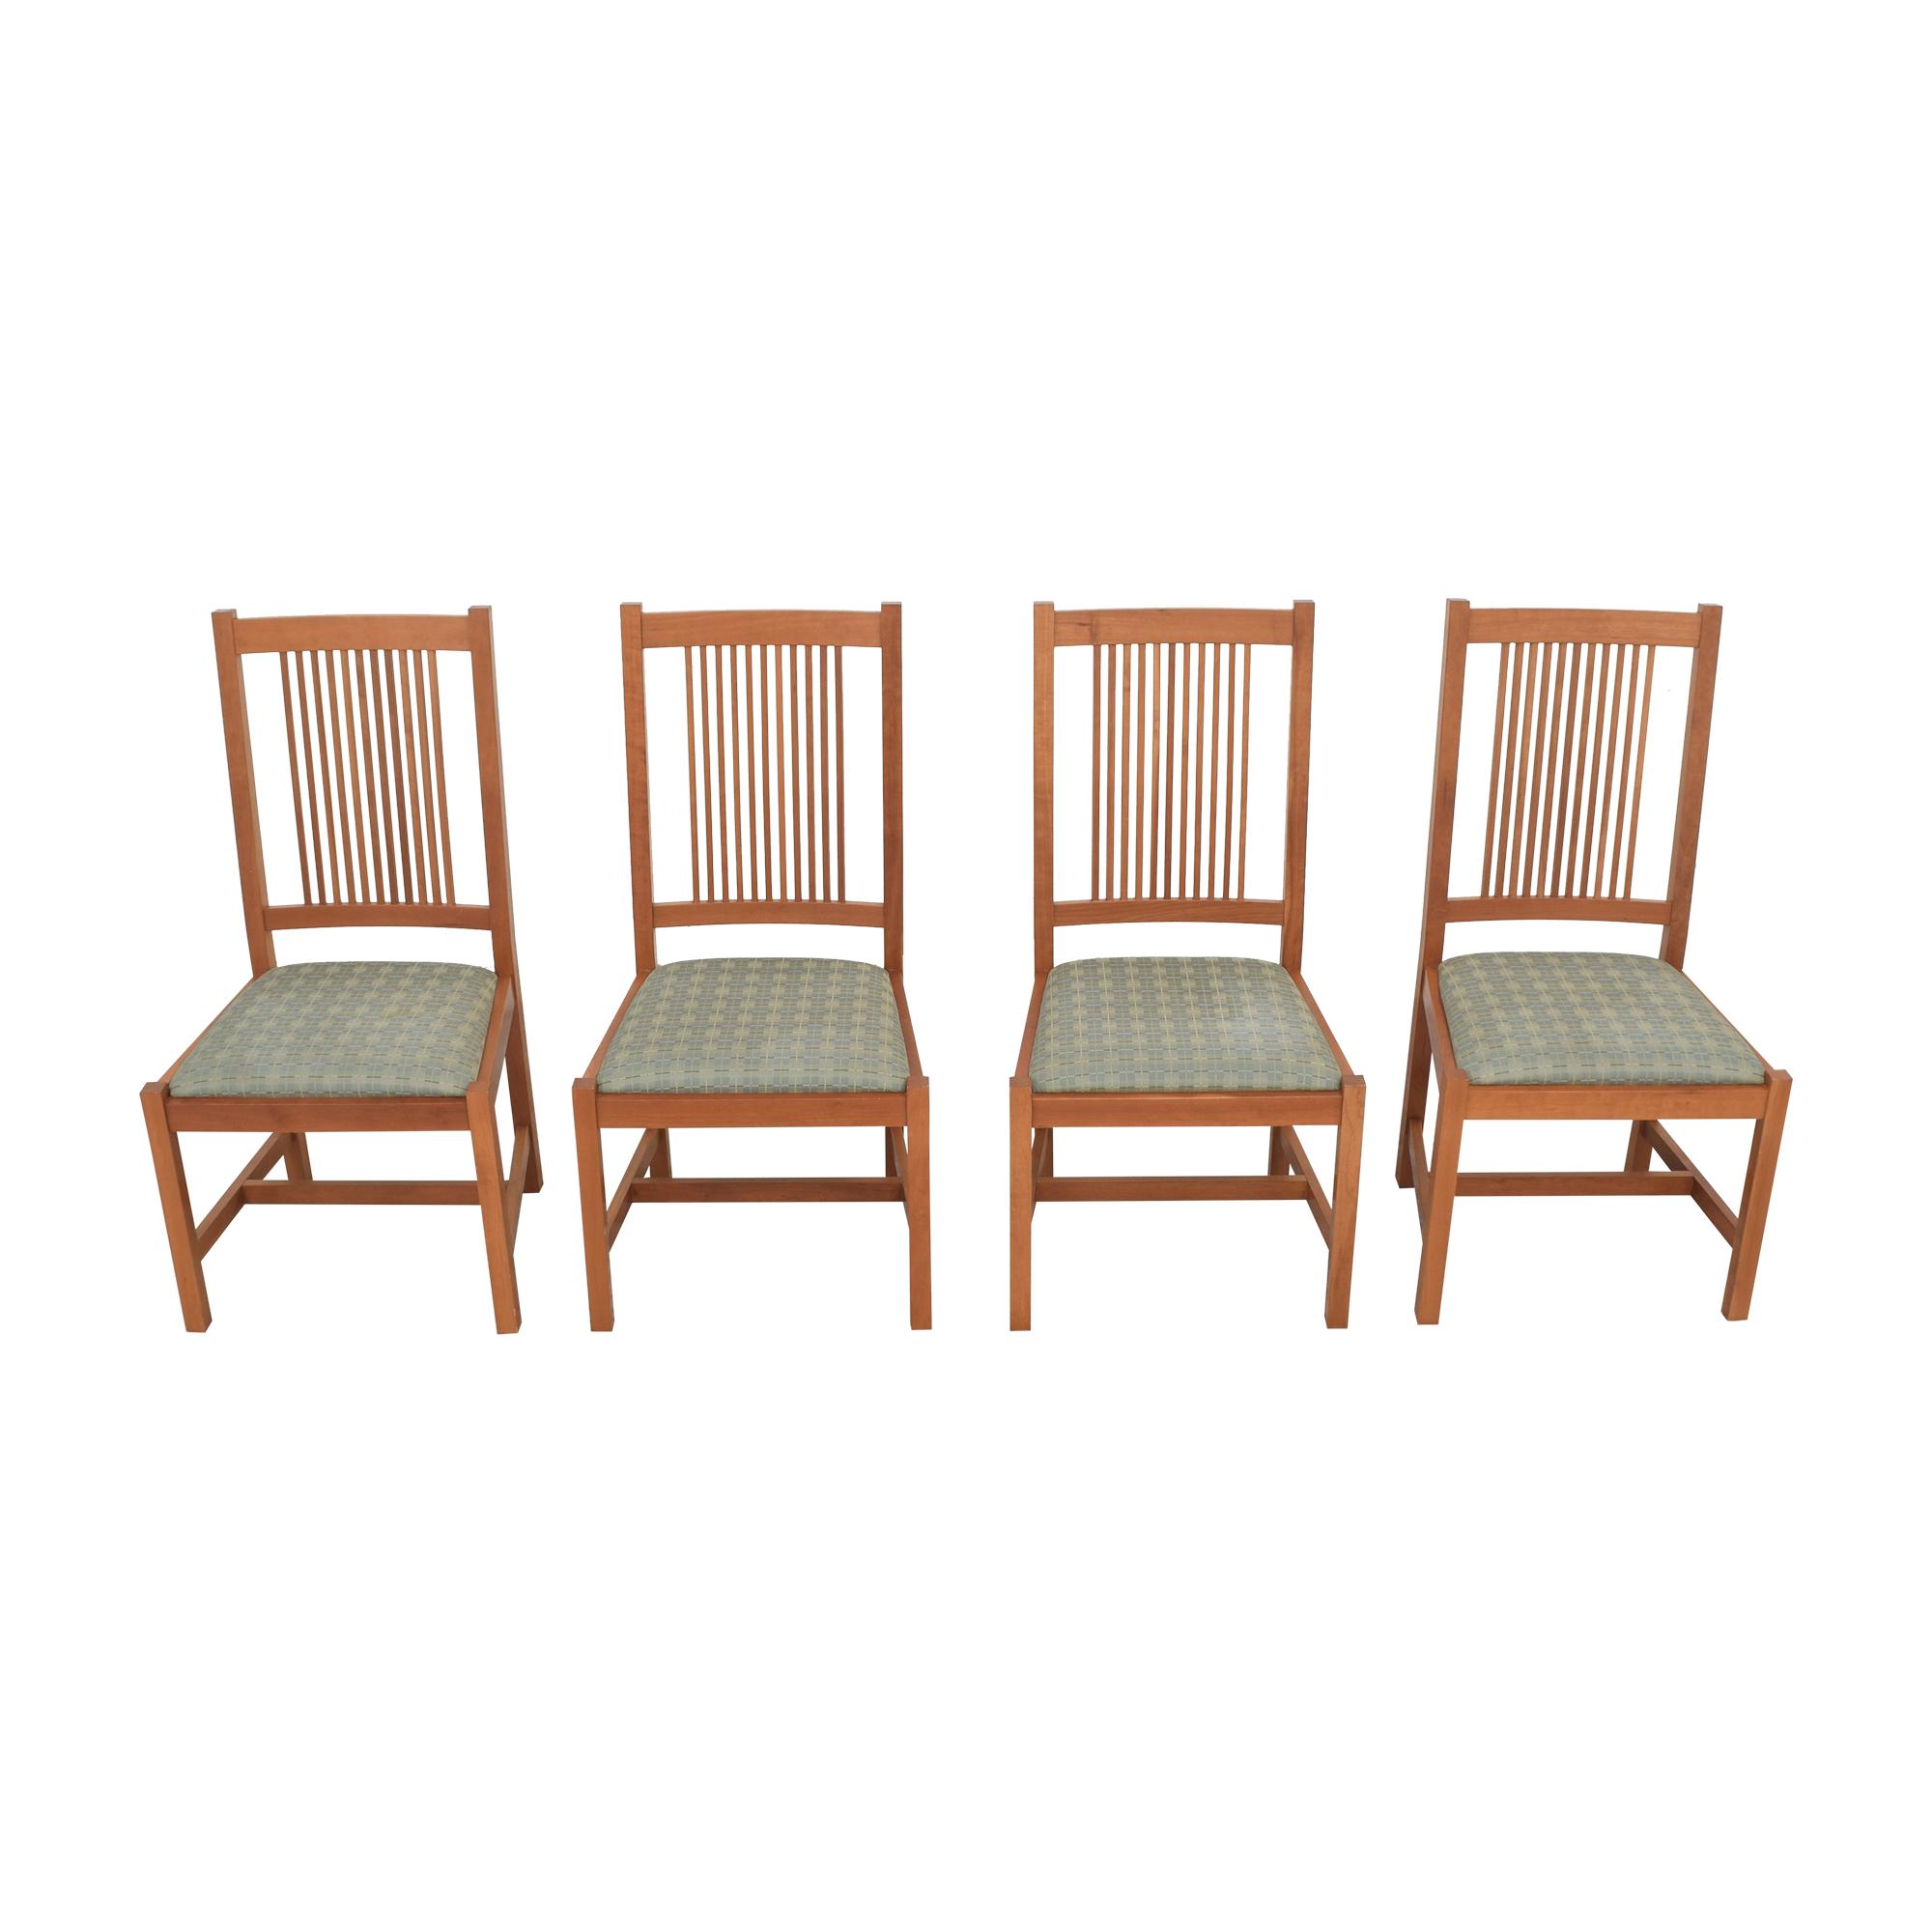 Scott Jordan Furniture Scott Jordan Mission Style Dining Chairs used